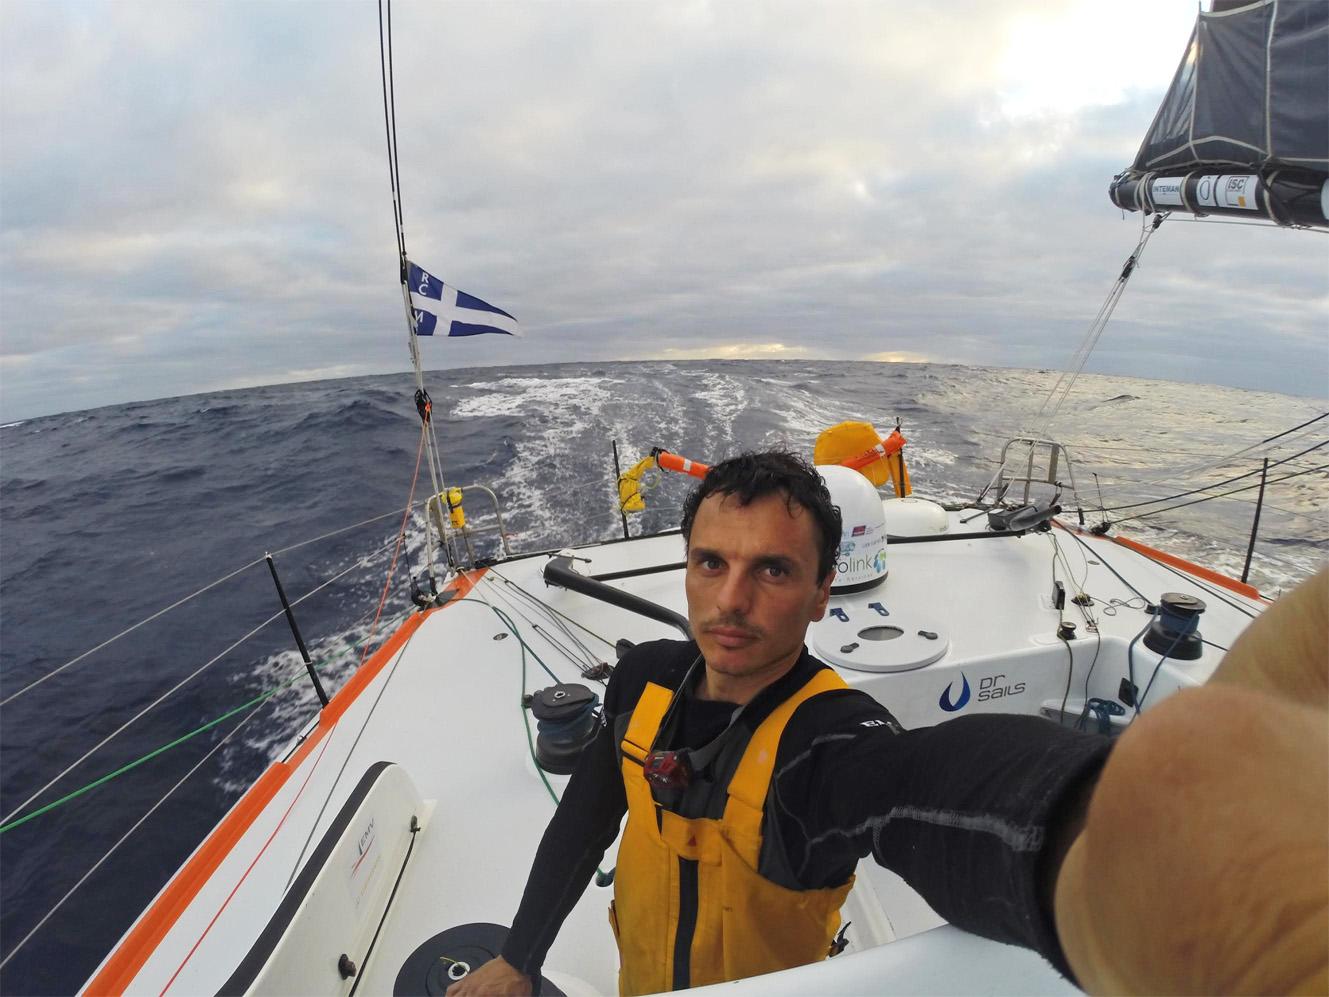 BECA MINITRANSAT 2023, una oportunidad única para competir en vela oceánica